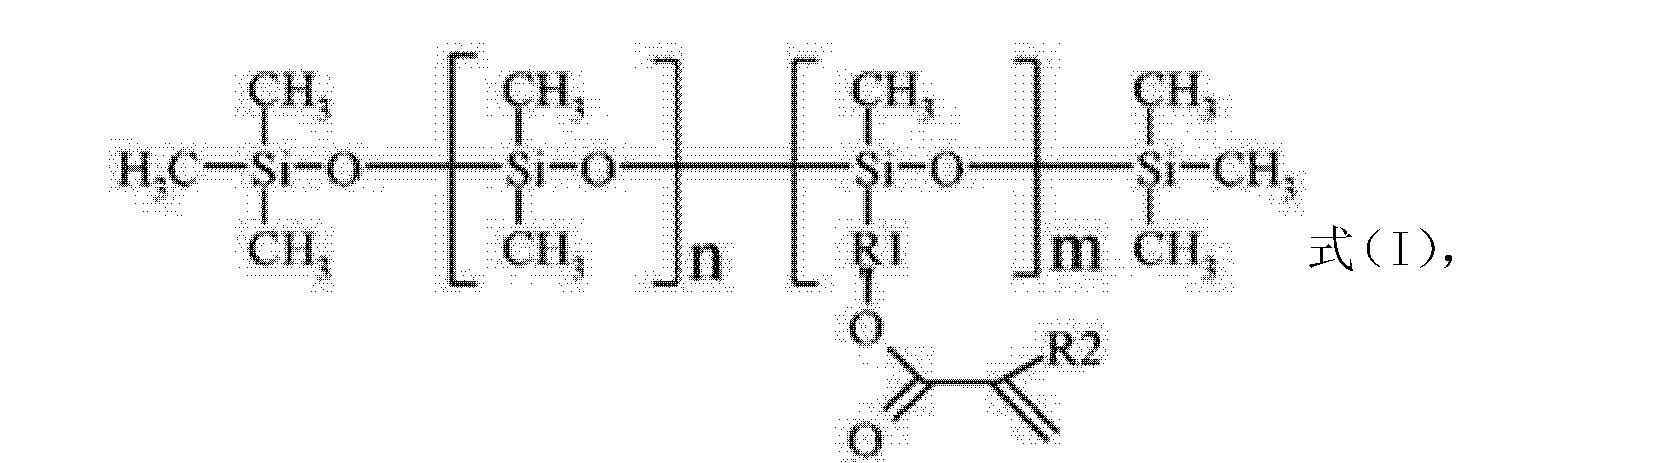 Figure CN104334359AD00101